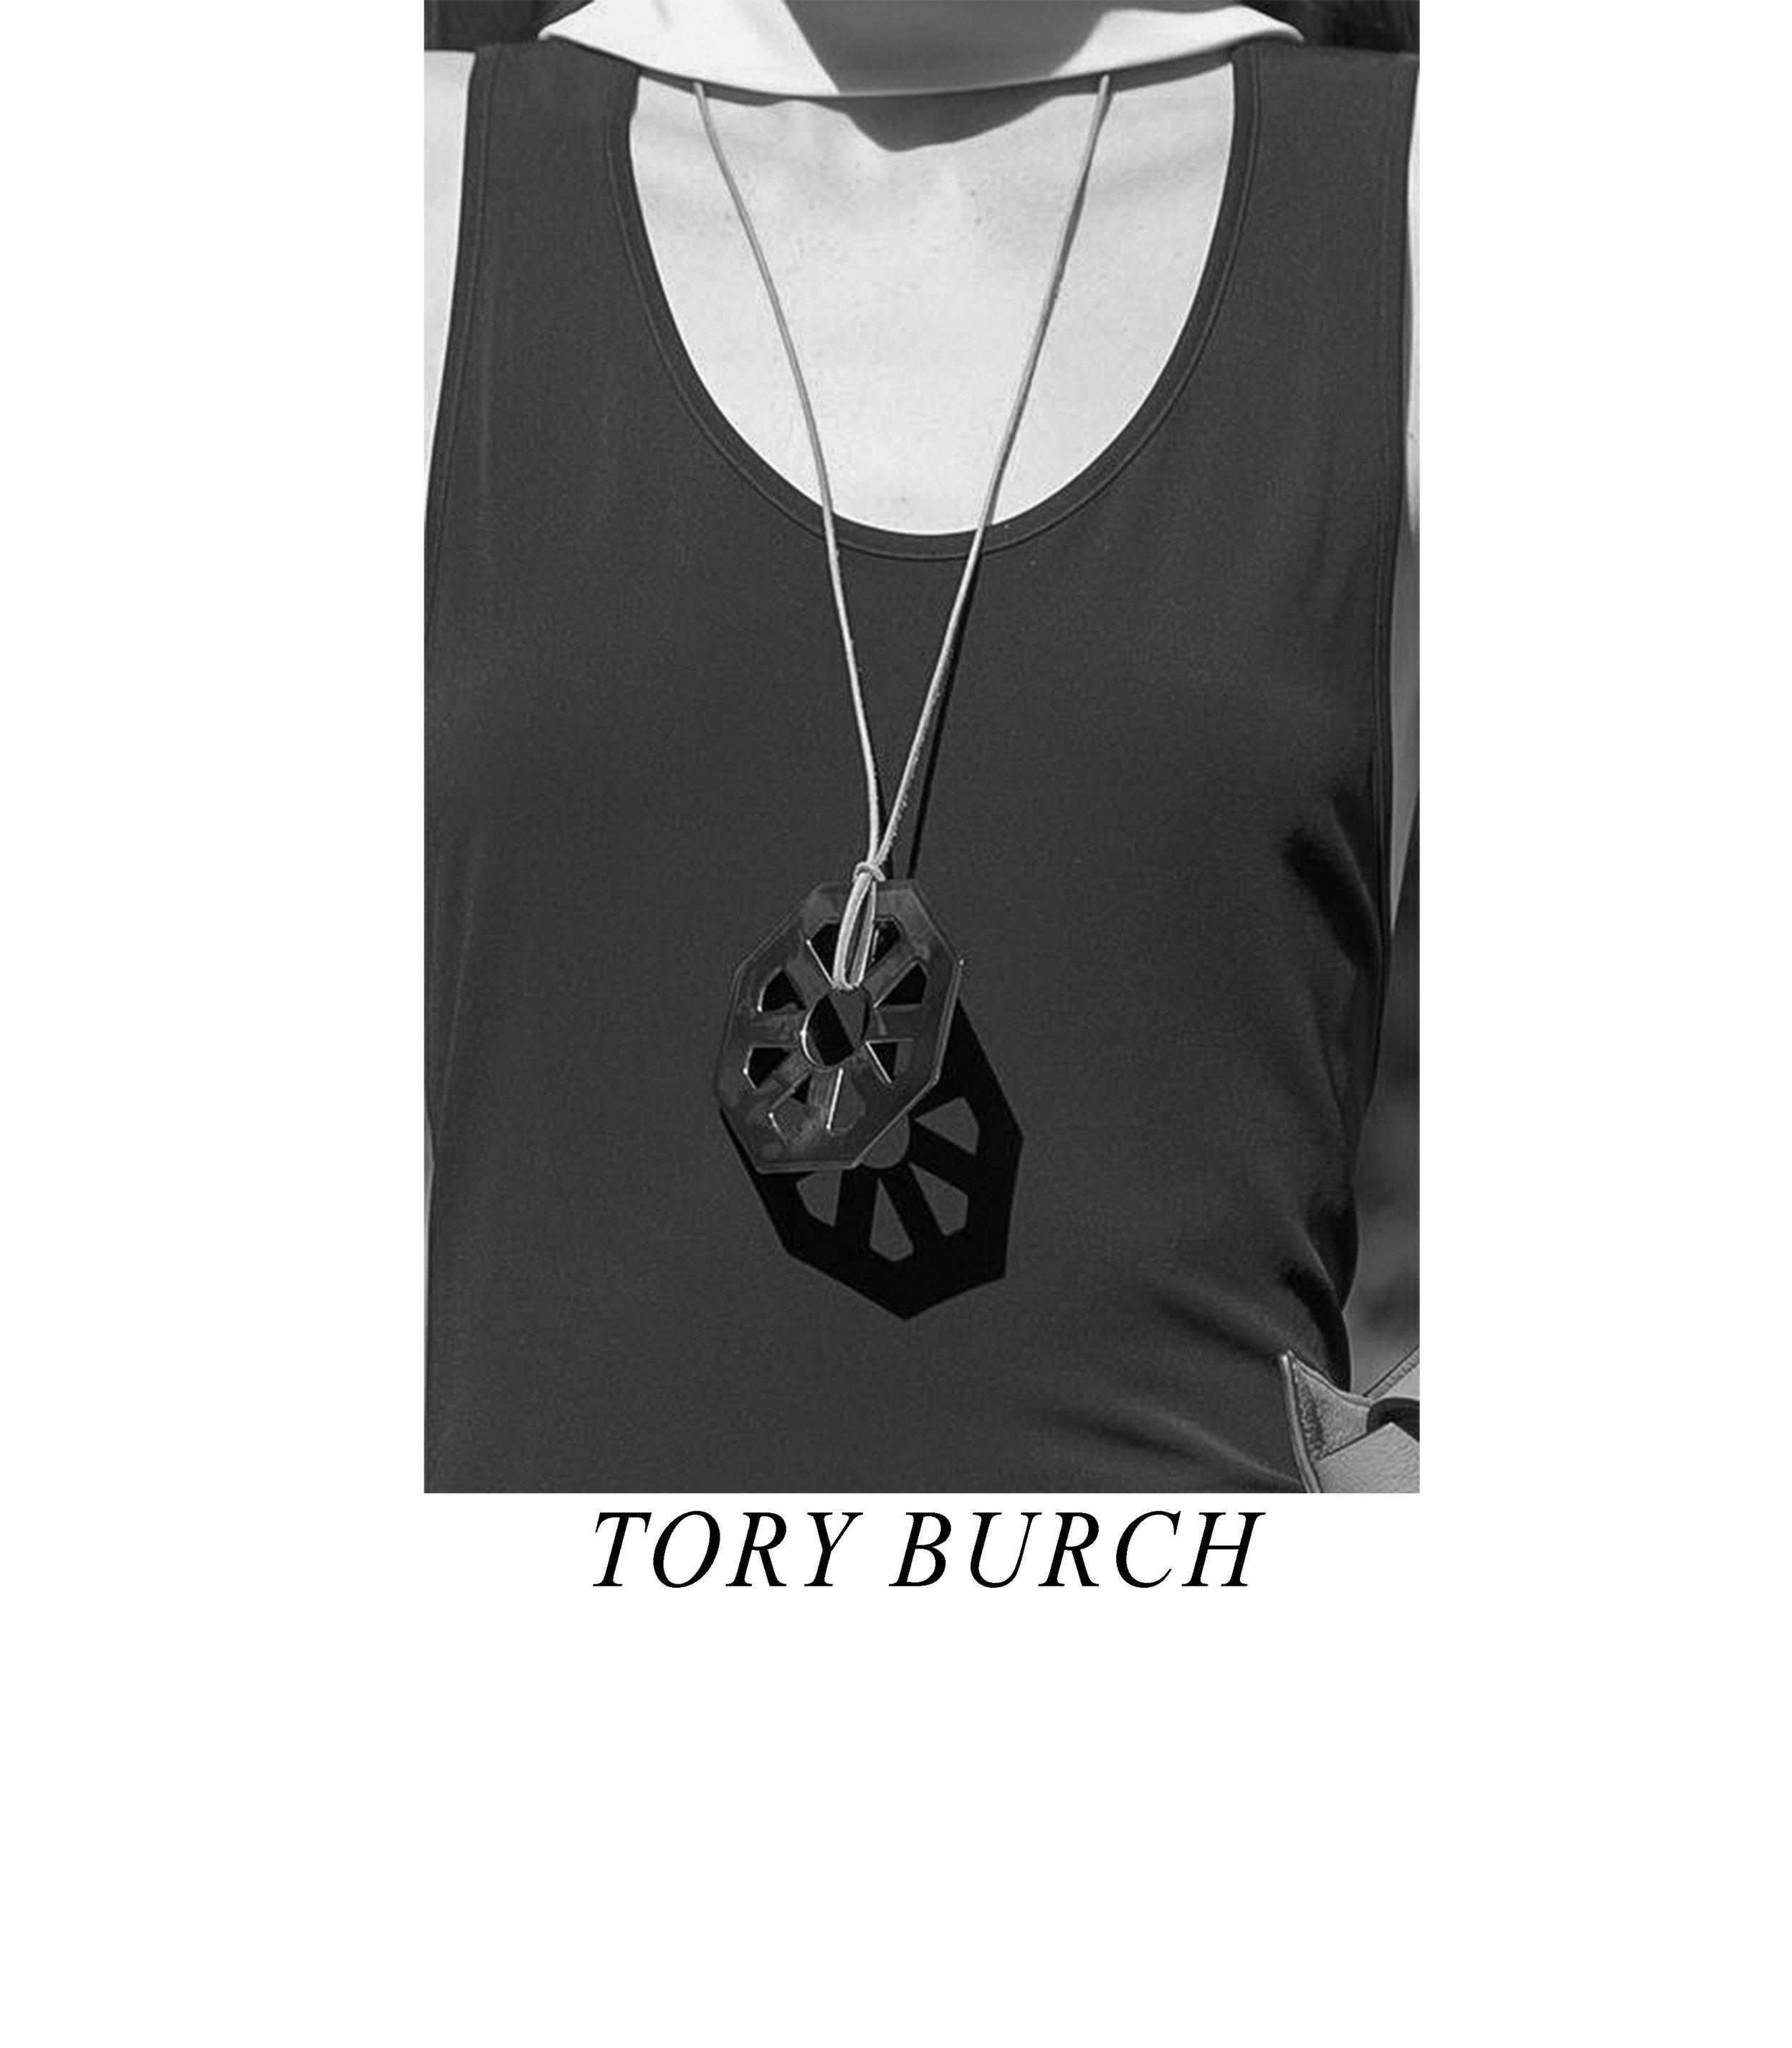 TORYBURCH.jpg